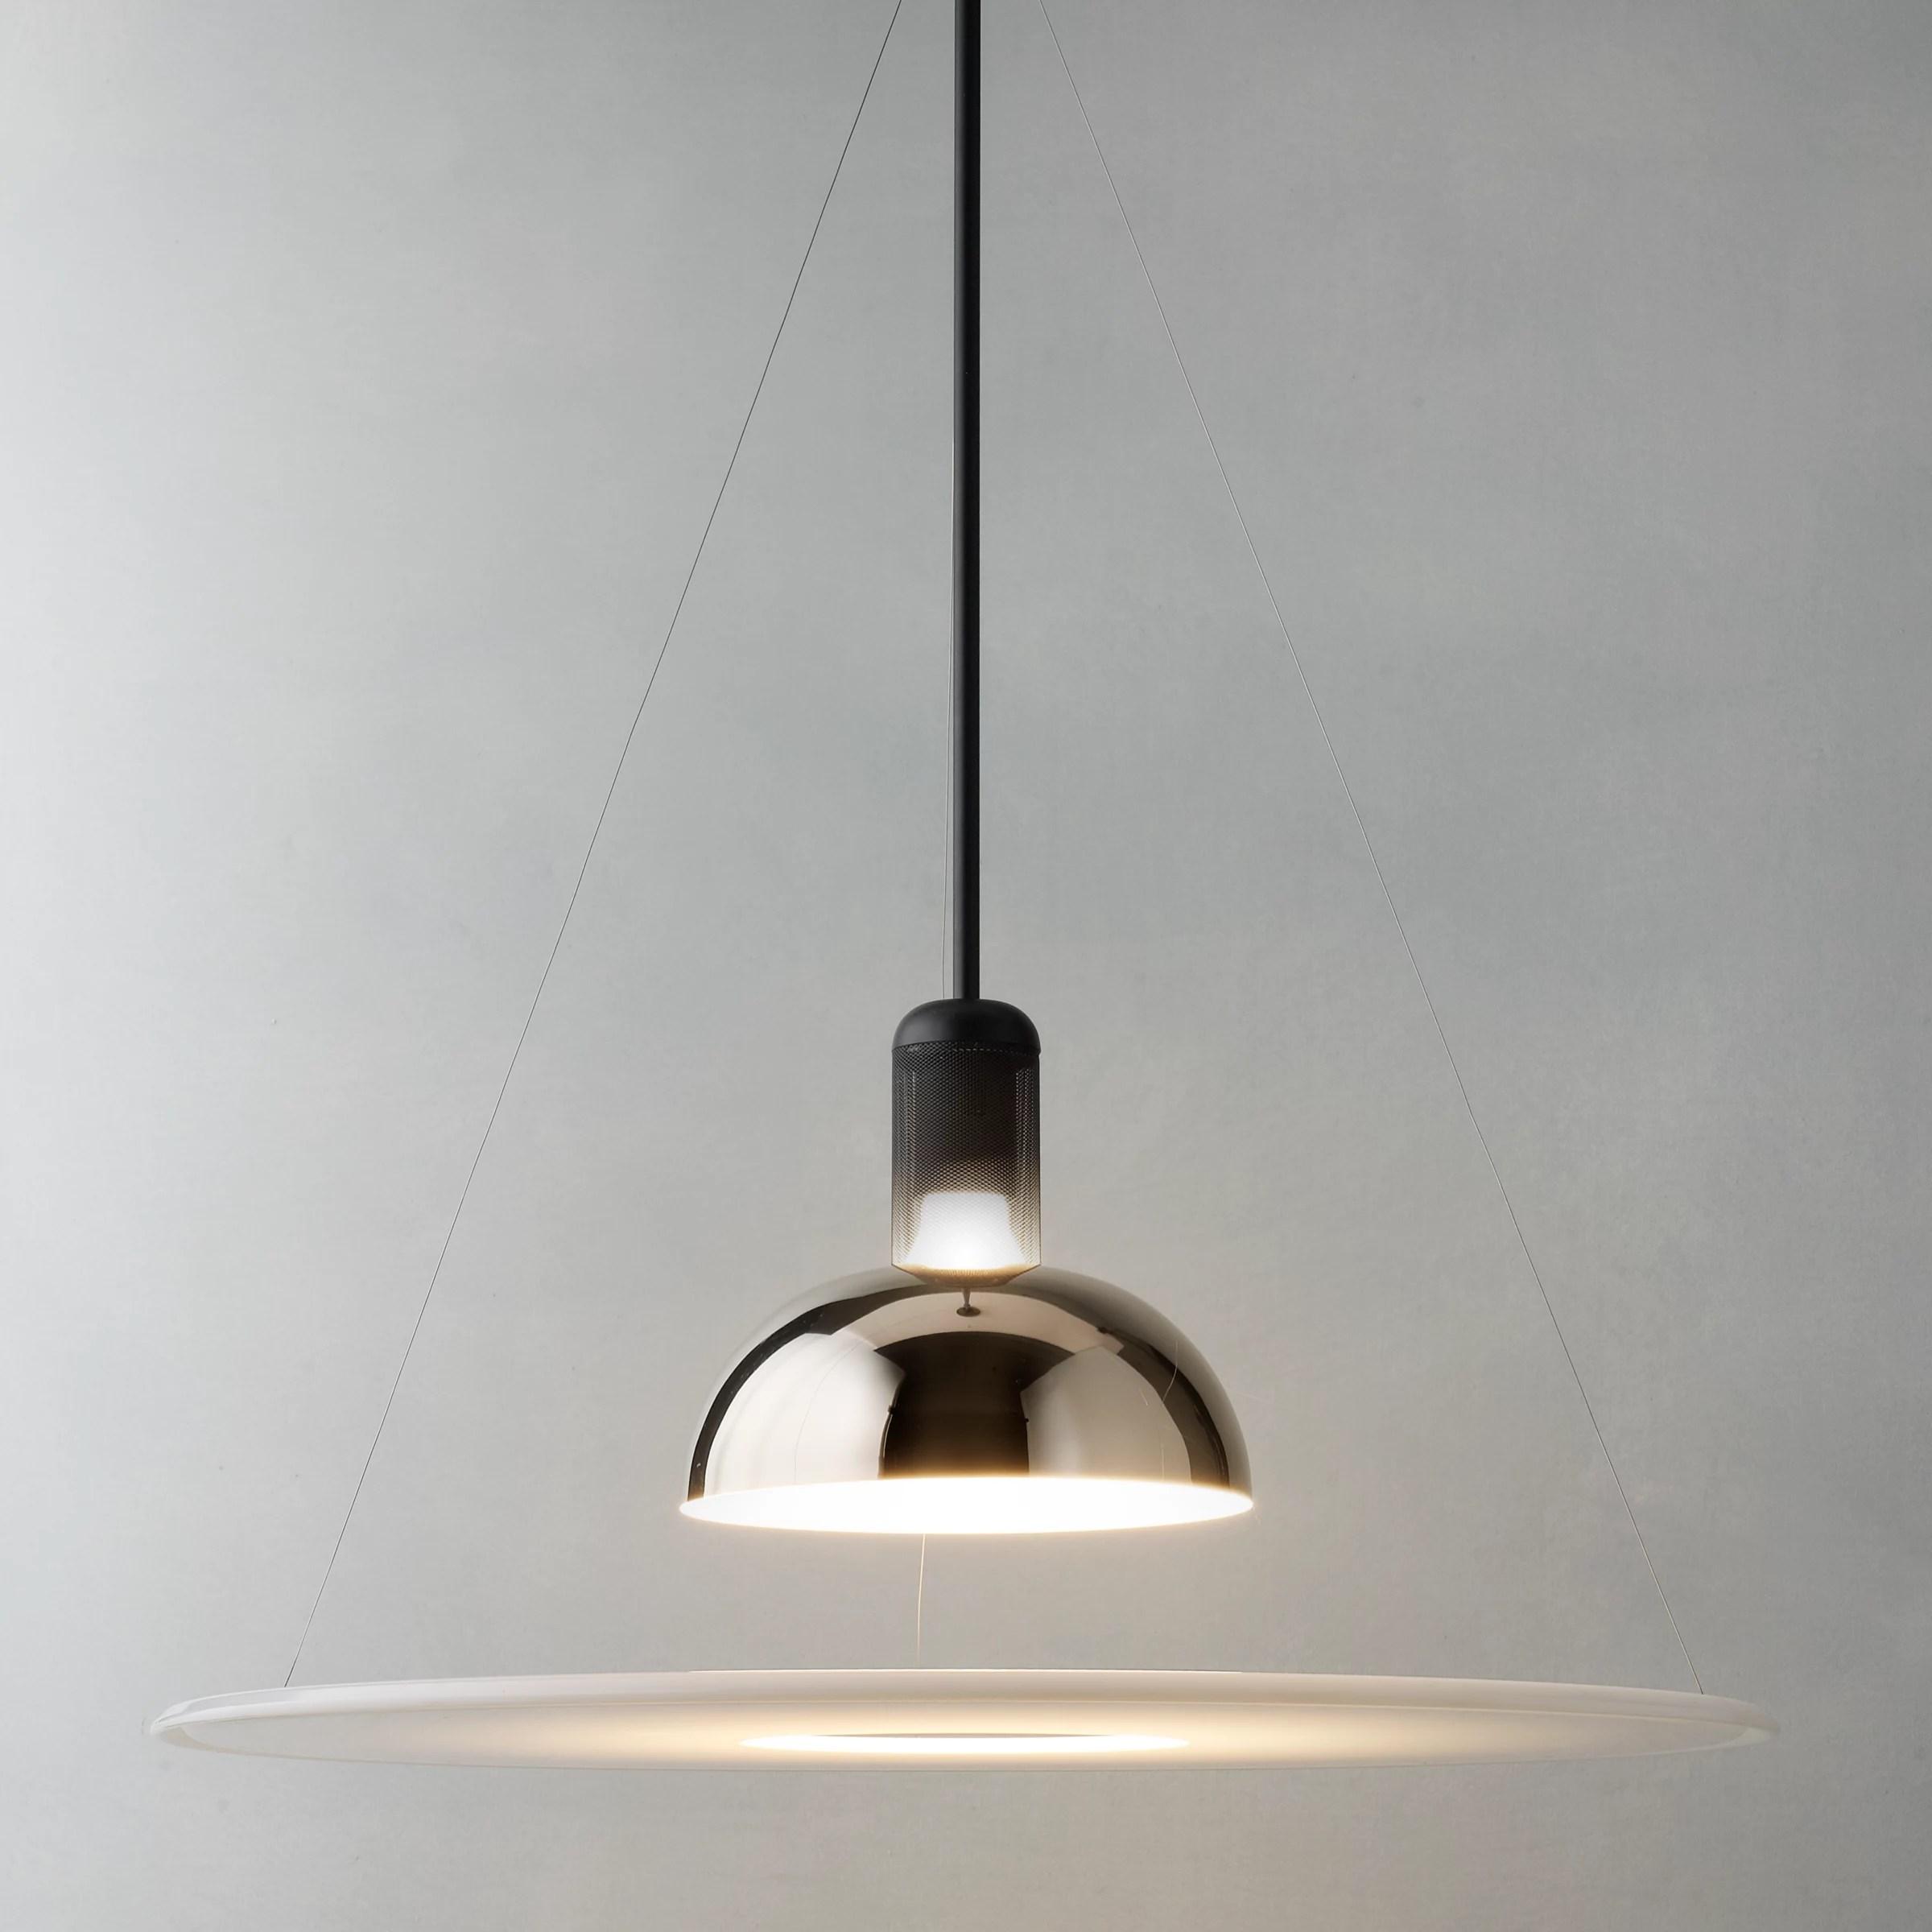 Flos Frisbi Ceiling Light at John Lewis & Partners